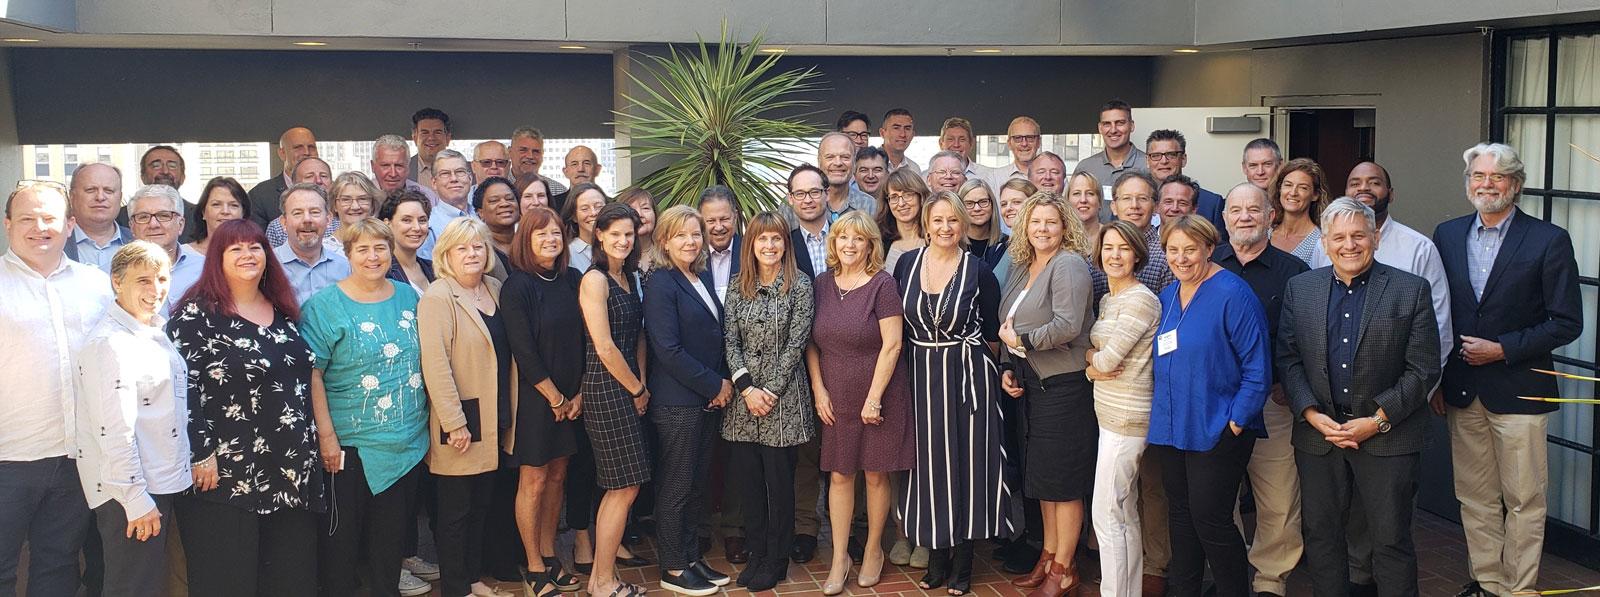 San Francisco Leadership Exchange, 2019